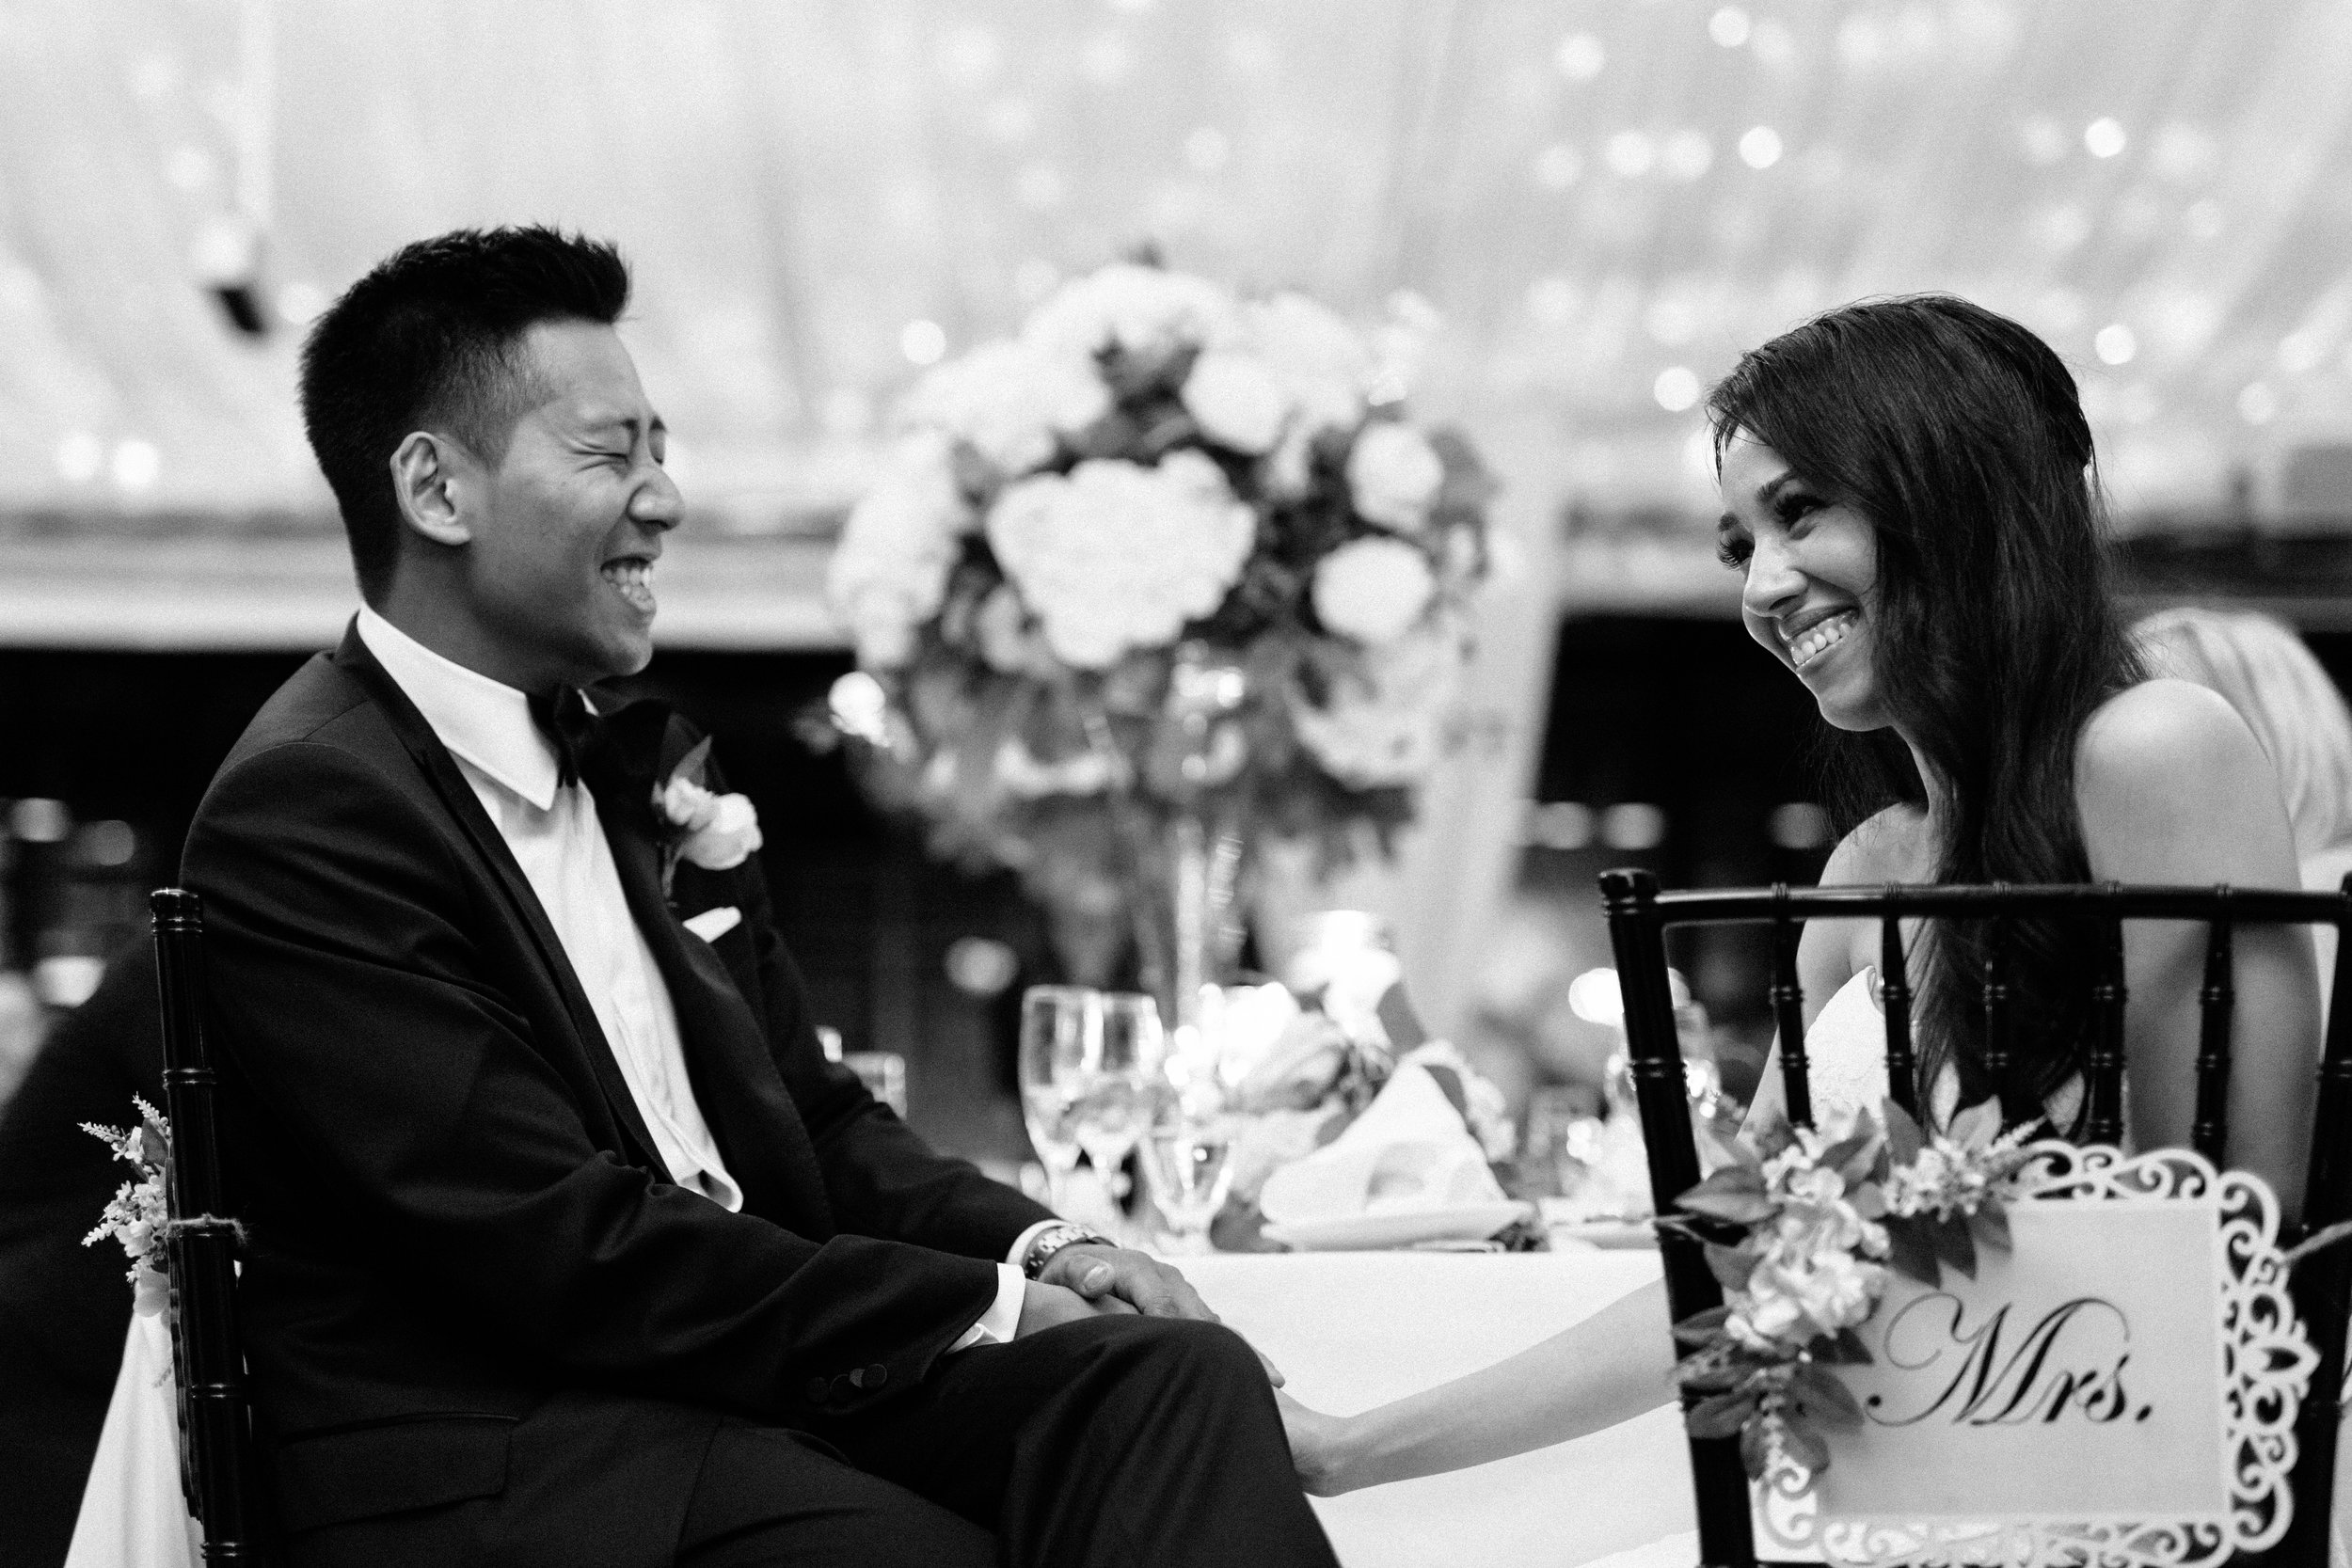 herafilms_wedding_priscilla_adrian_hera_selects-67.jpg